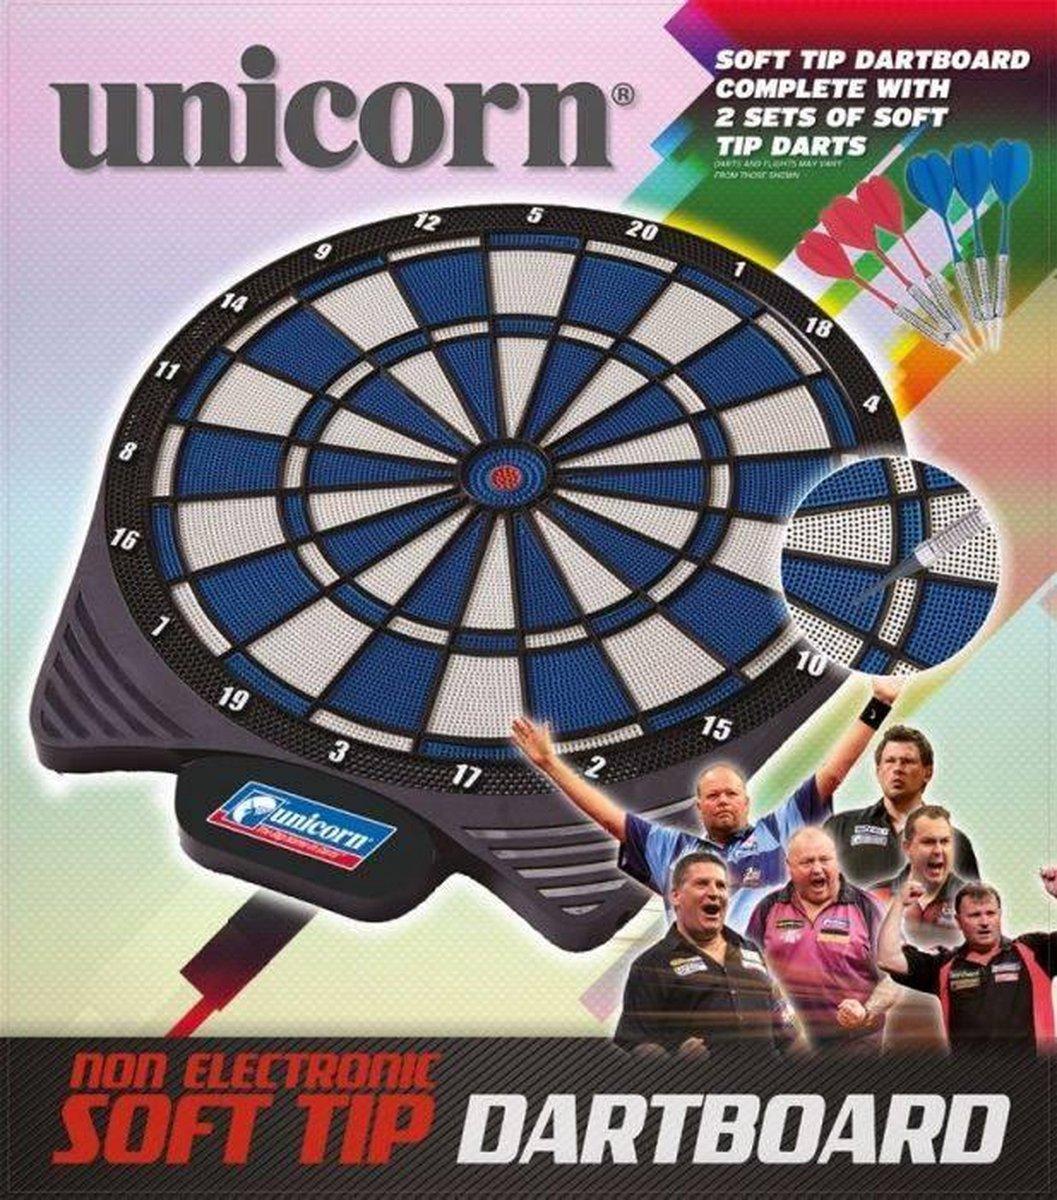 Unicorn non Electronic softtip dartbord